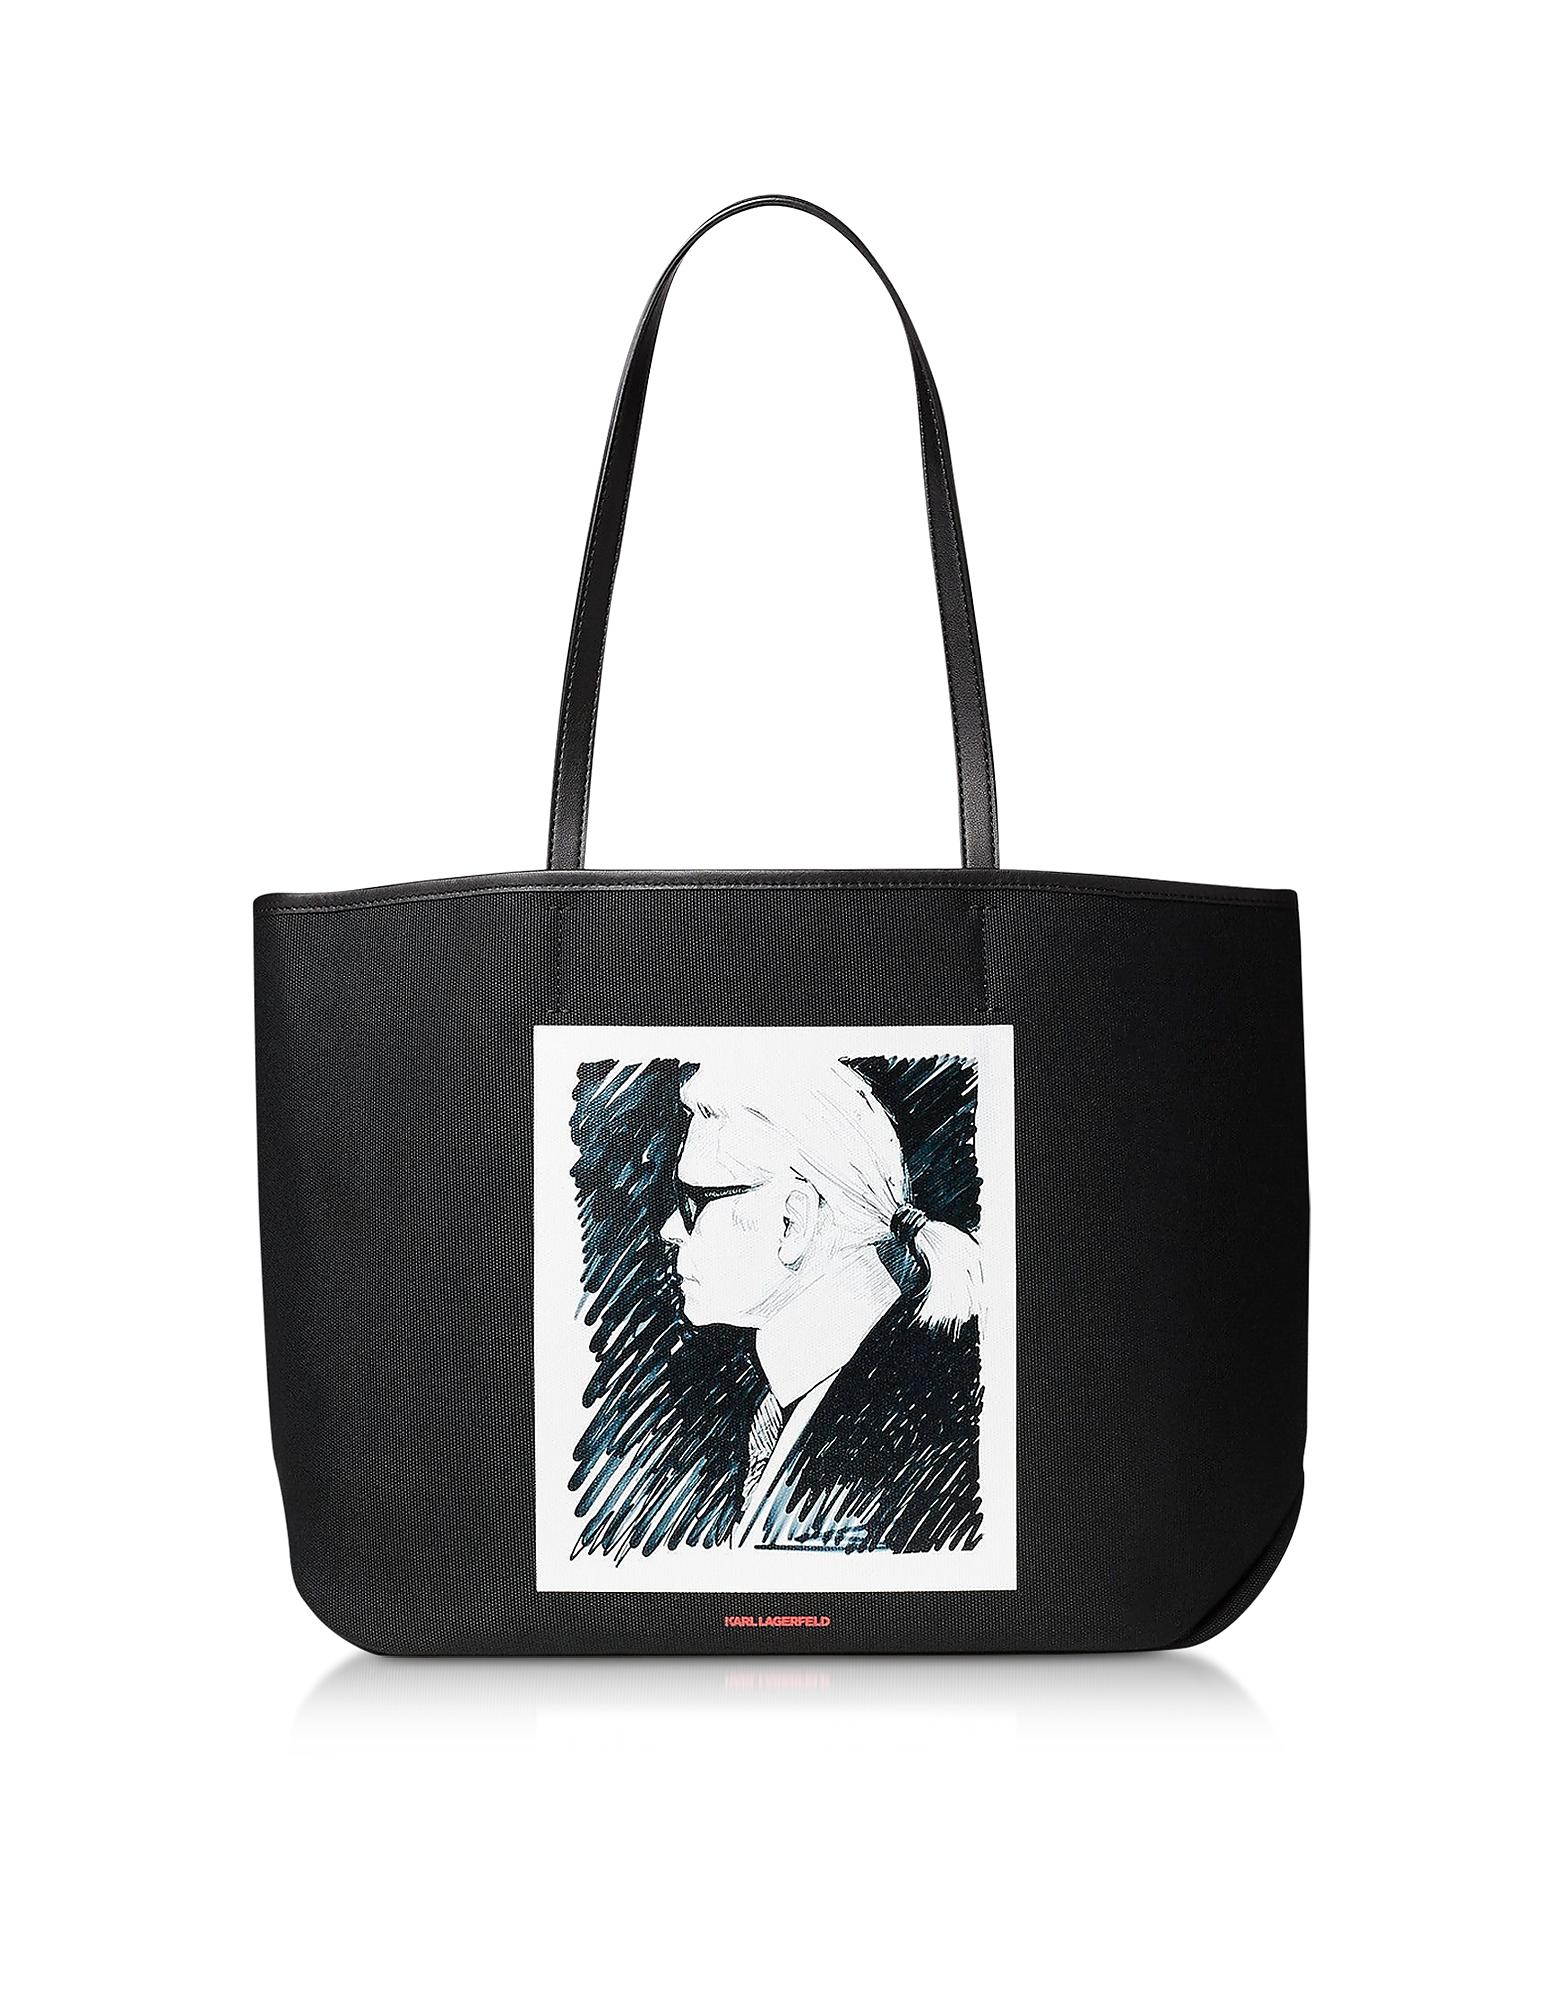 Karl Lagerfeld Designer Handbags, Karl Legend Canvas Tote